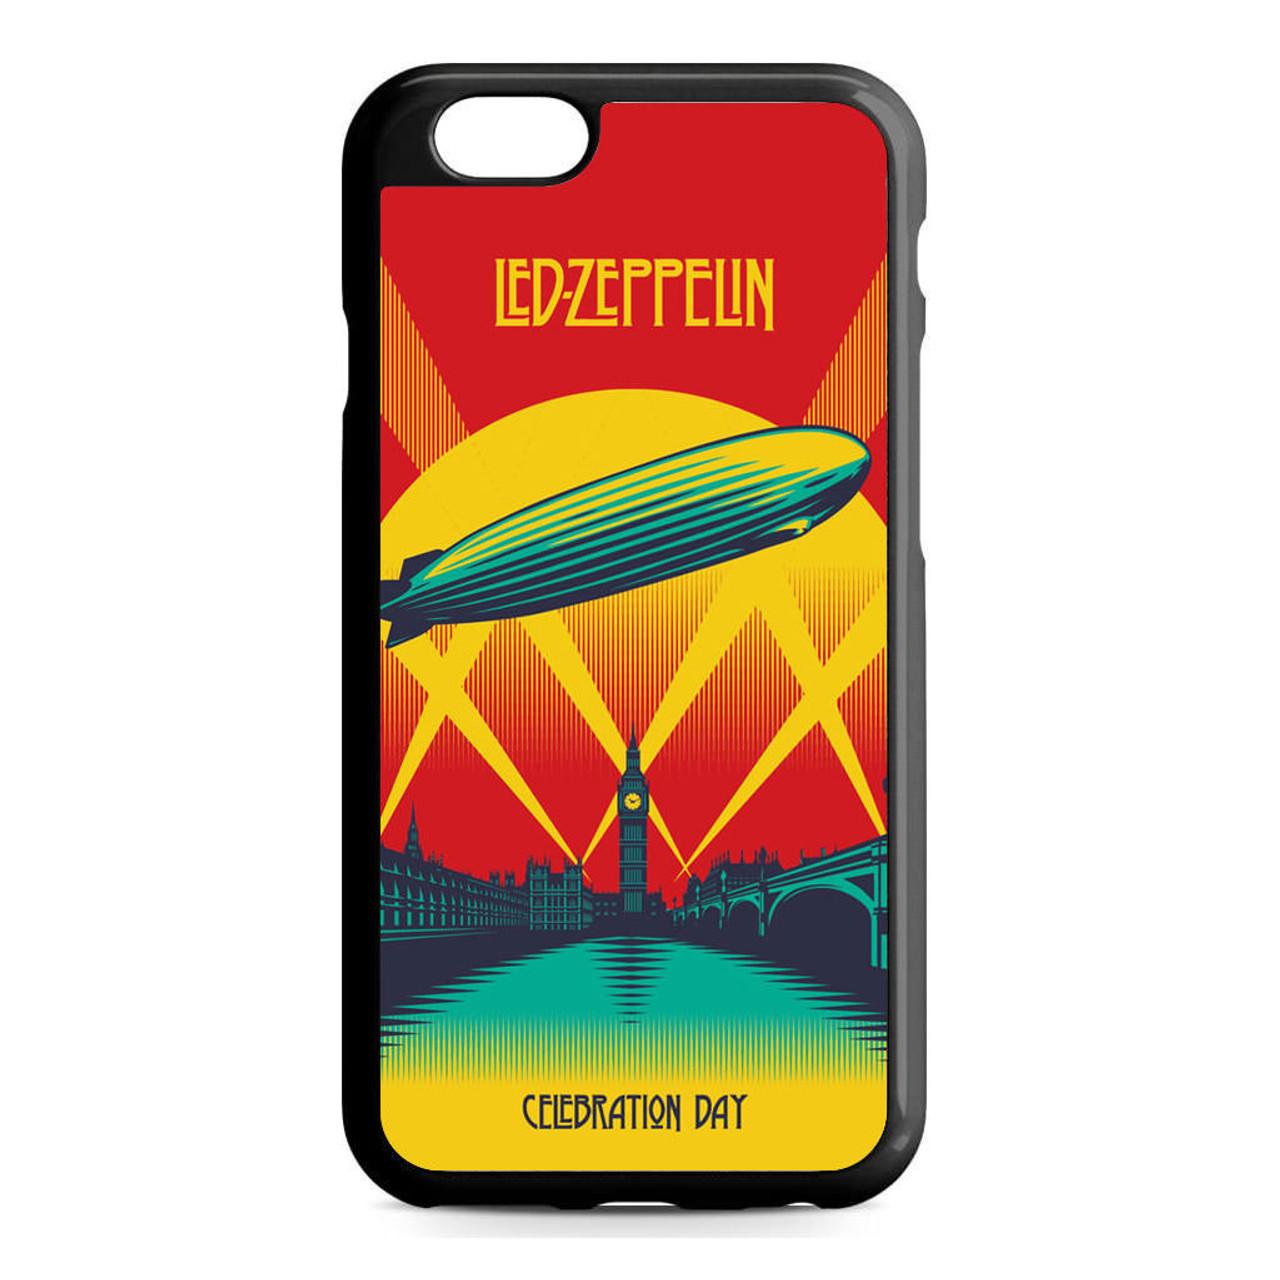 promo code 3d477 1ce93 Led Zeppelin iPhone 6/6S Case